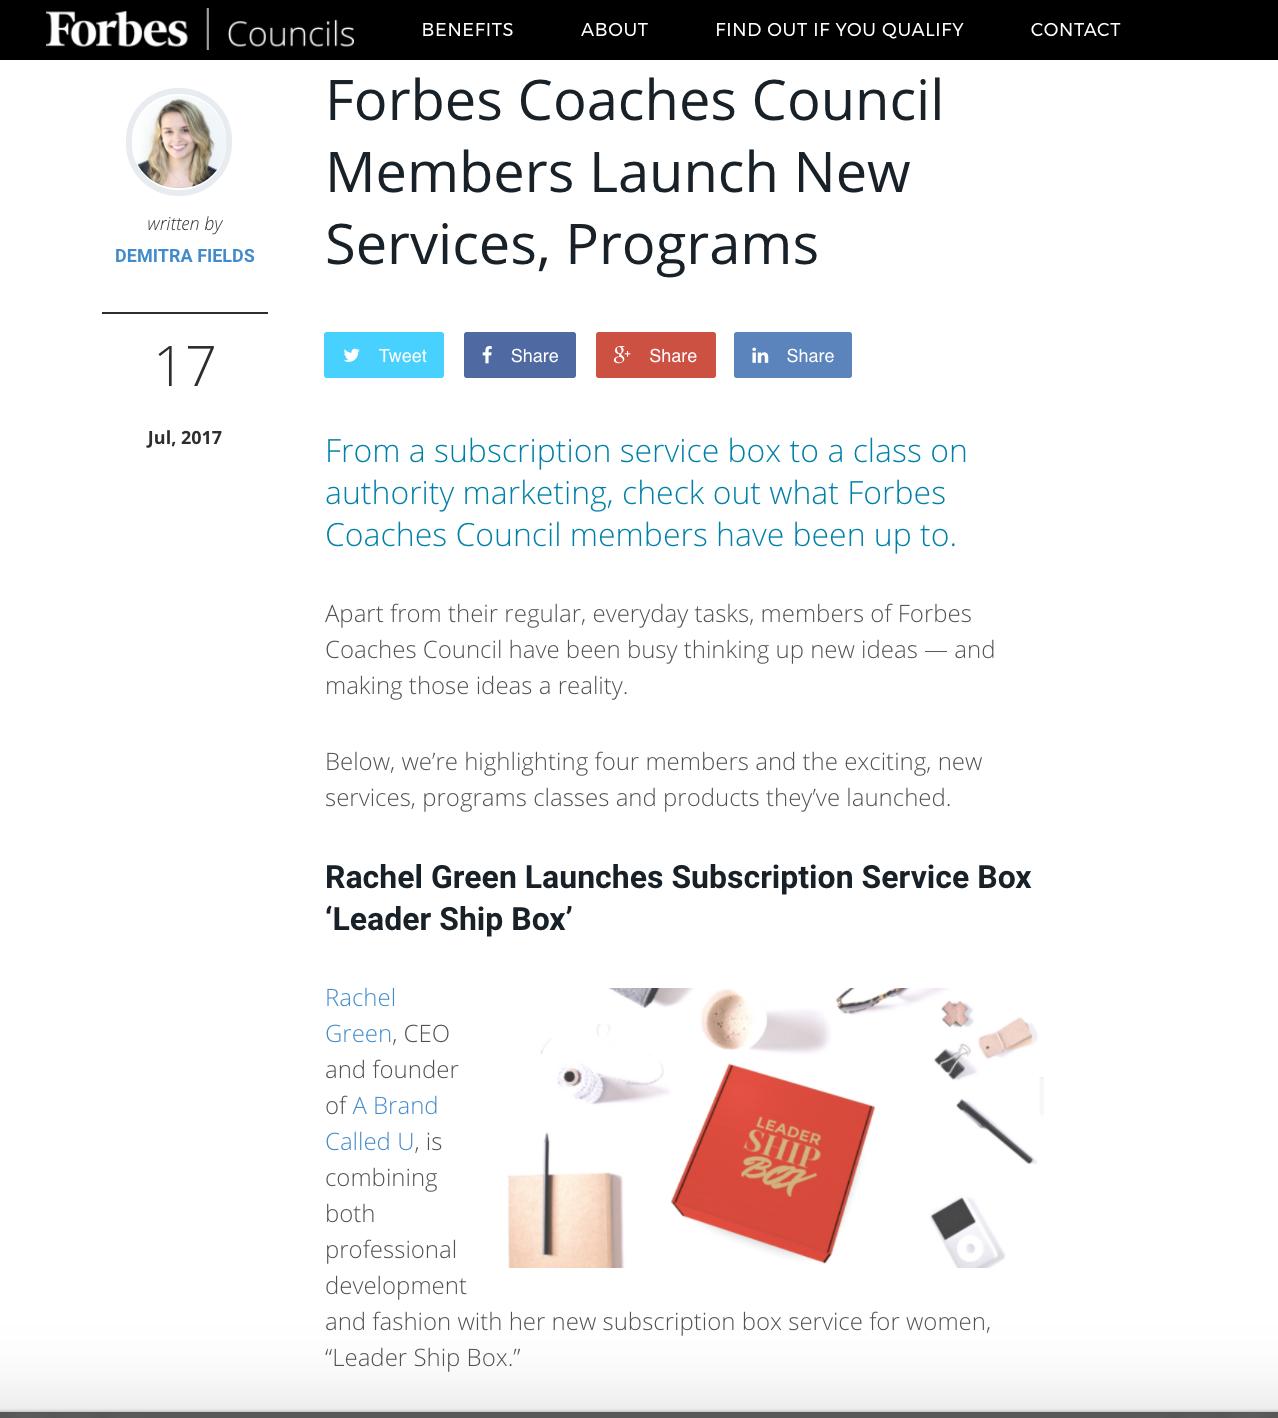 PRESS | A Brand Called U | Client Coverage